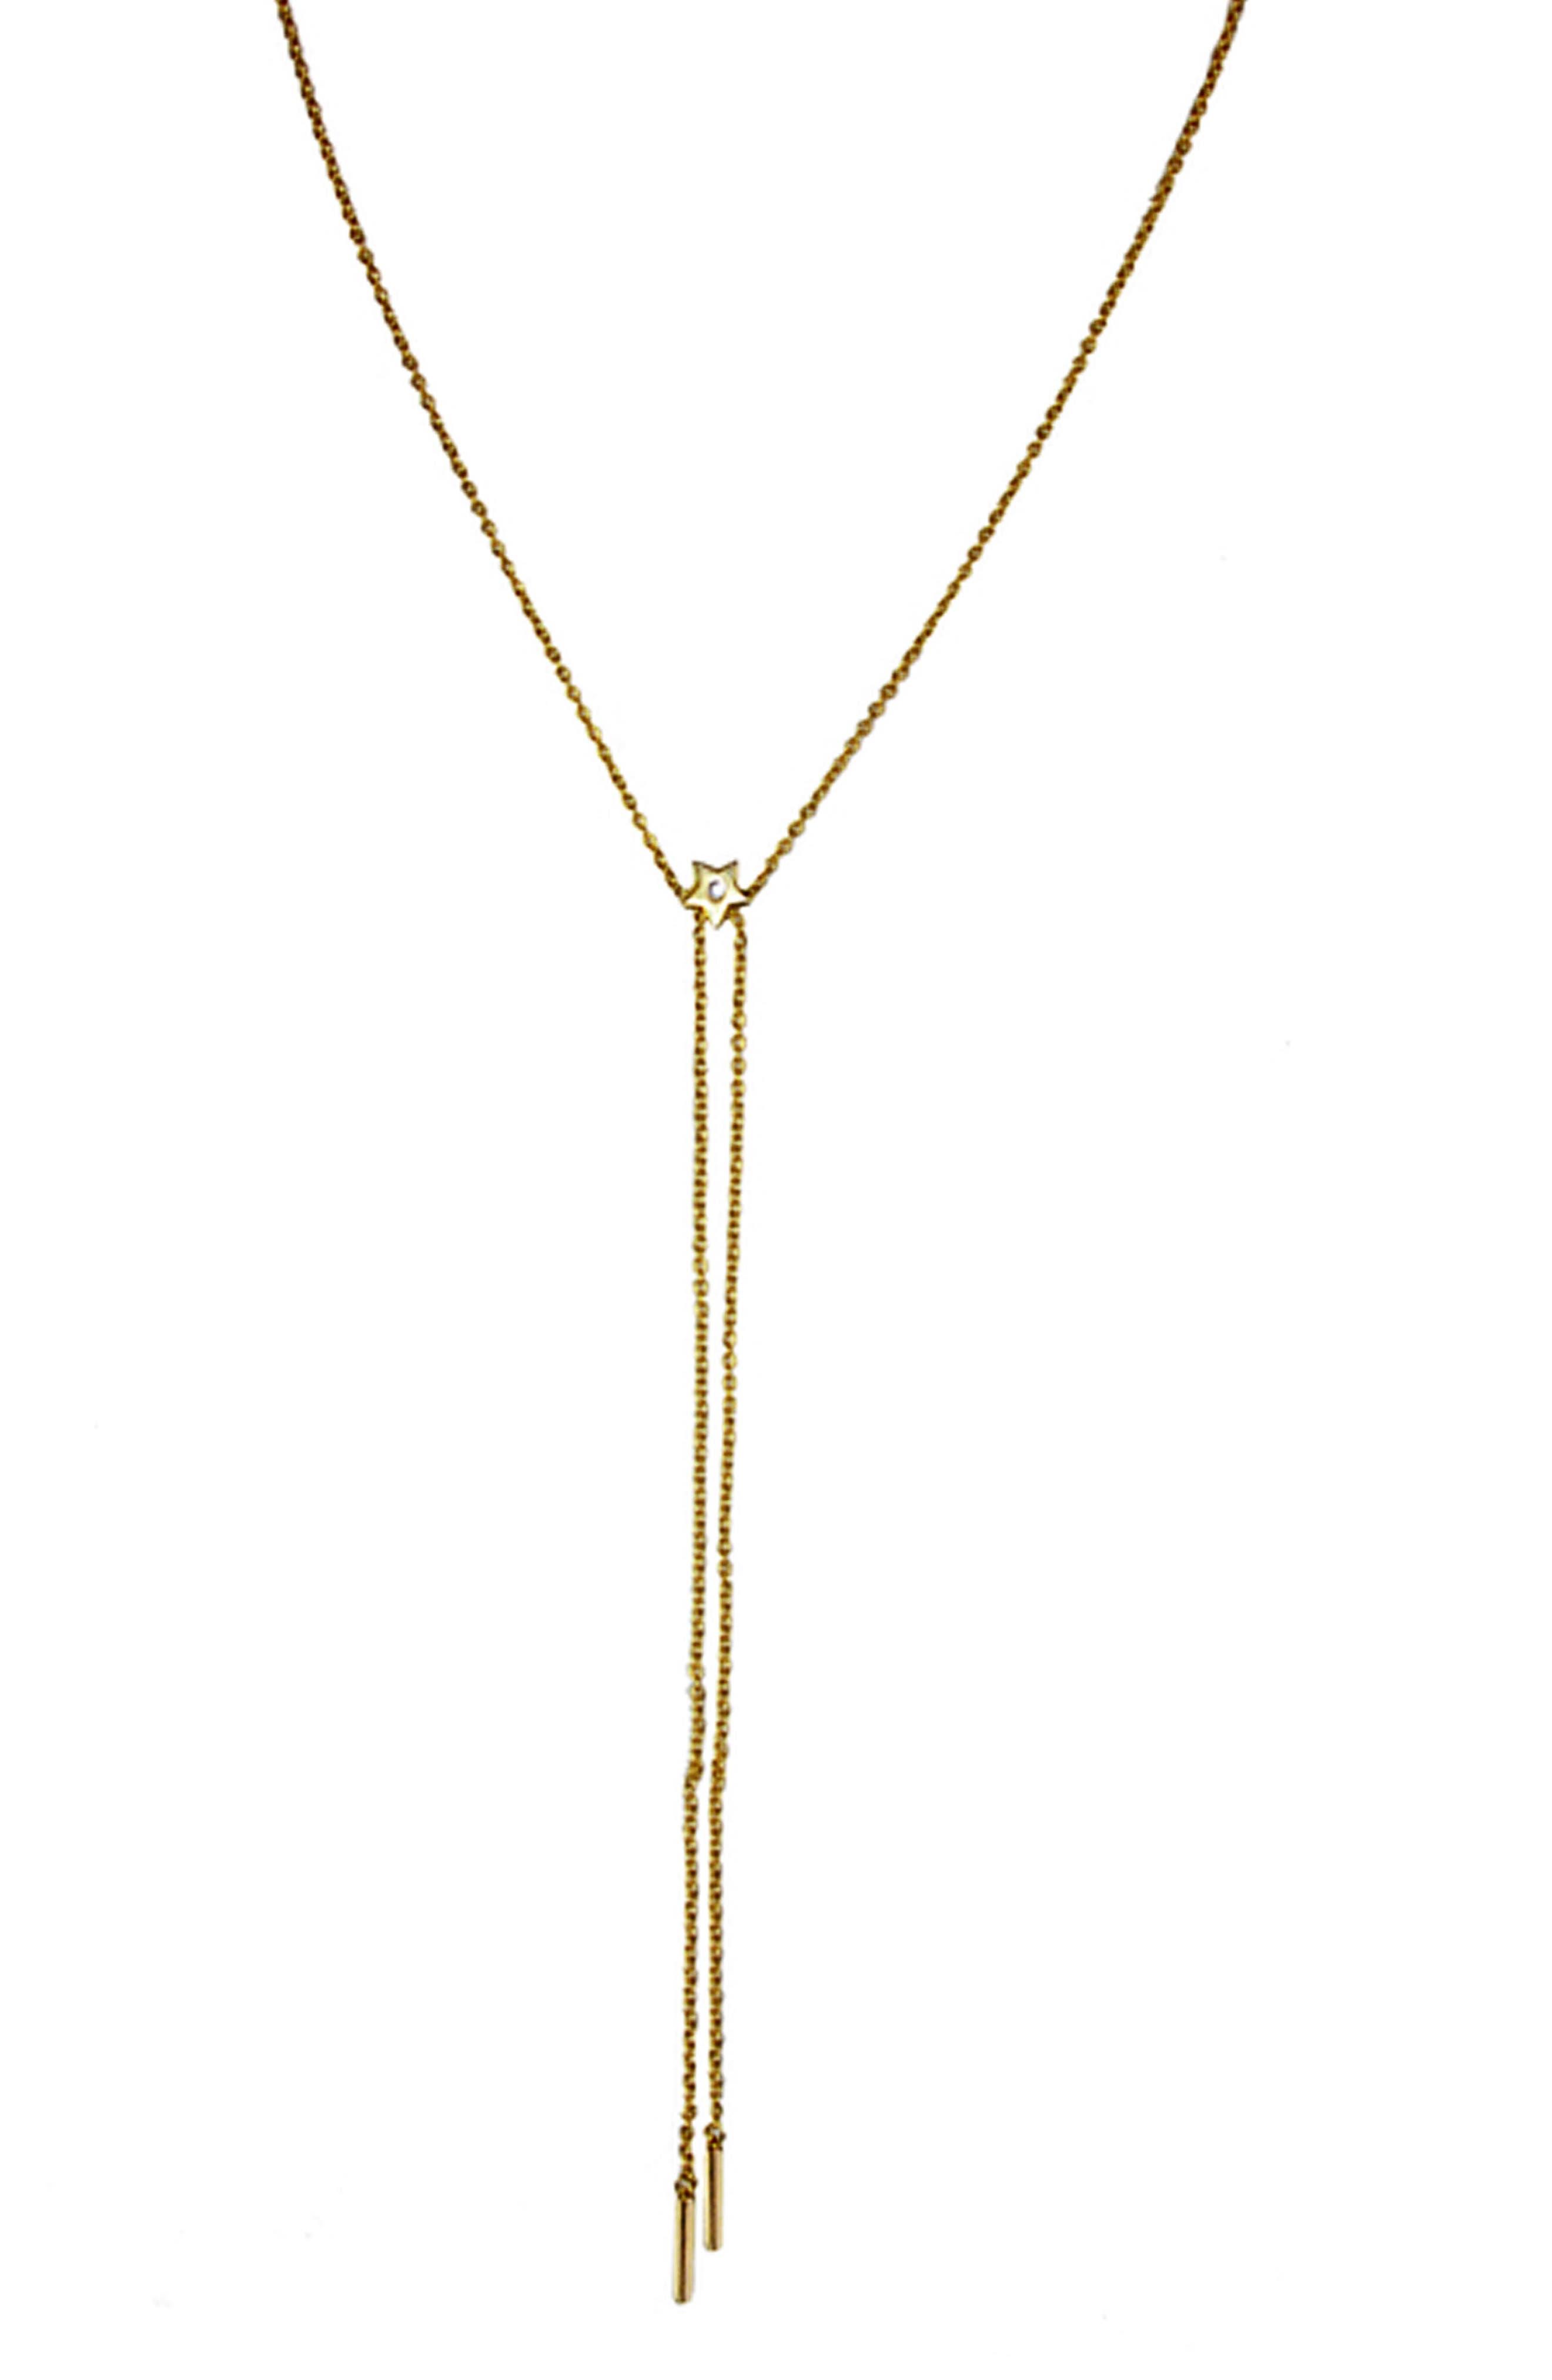 Main Image - Jules Smith Star Slide Lariat Choker Necklace